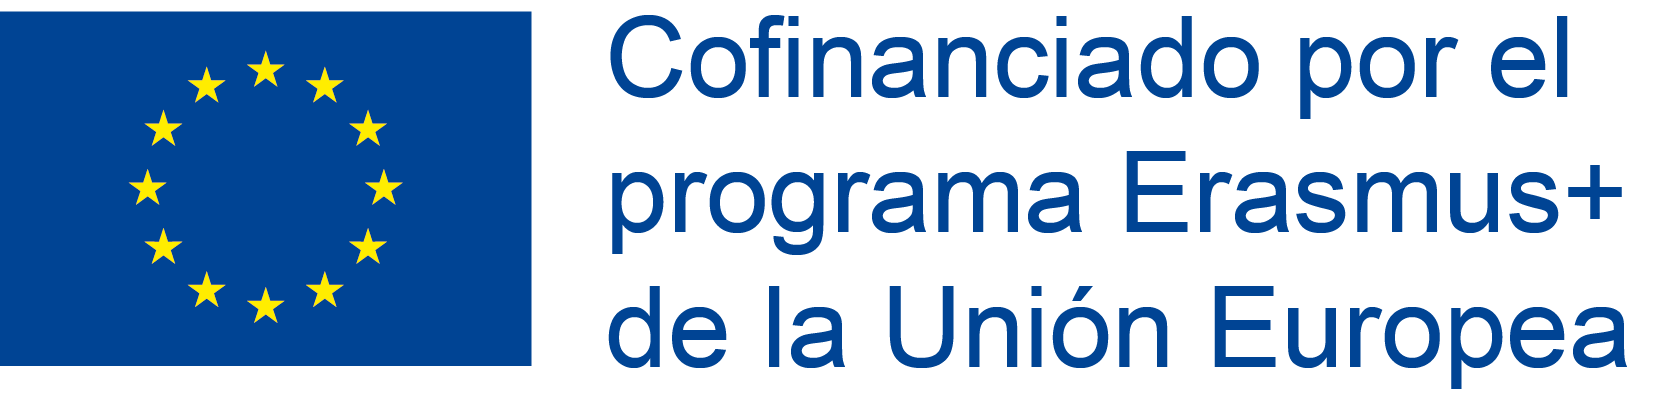 http://sepie.es/doc/comunicacion/logos/cofinanciado.png